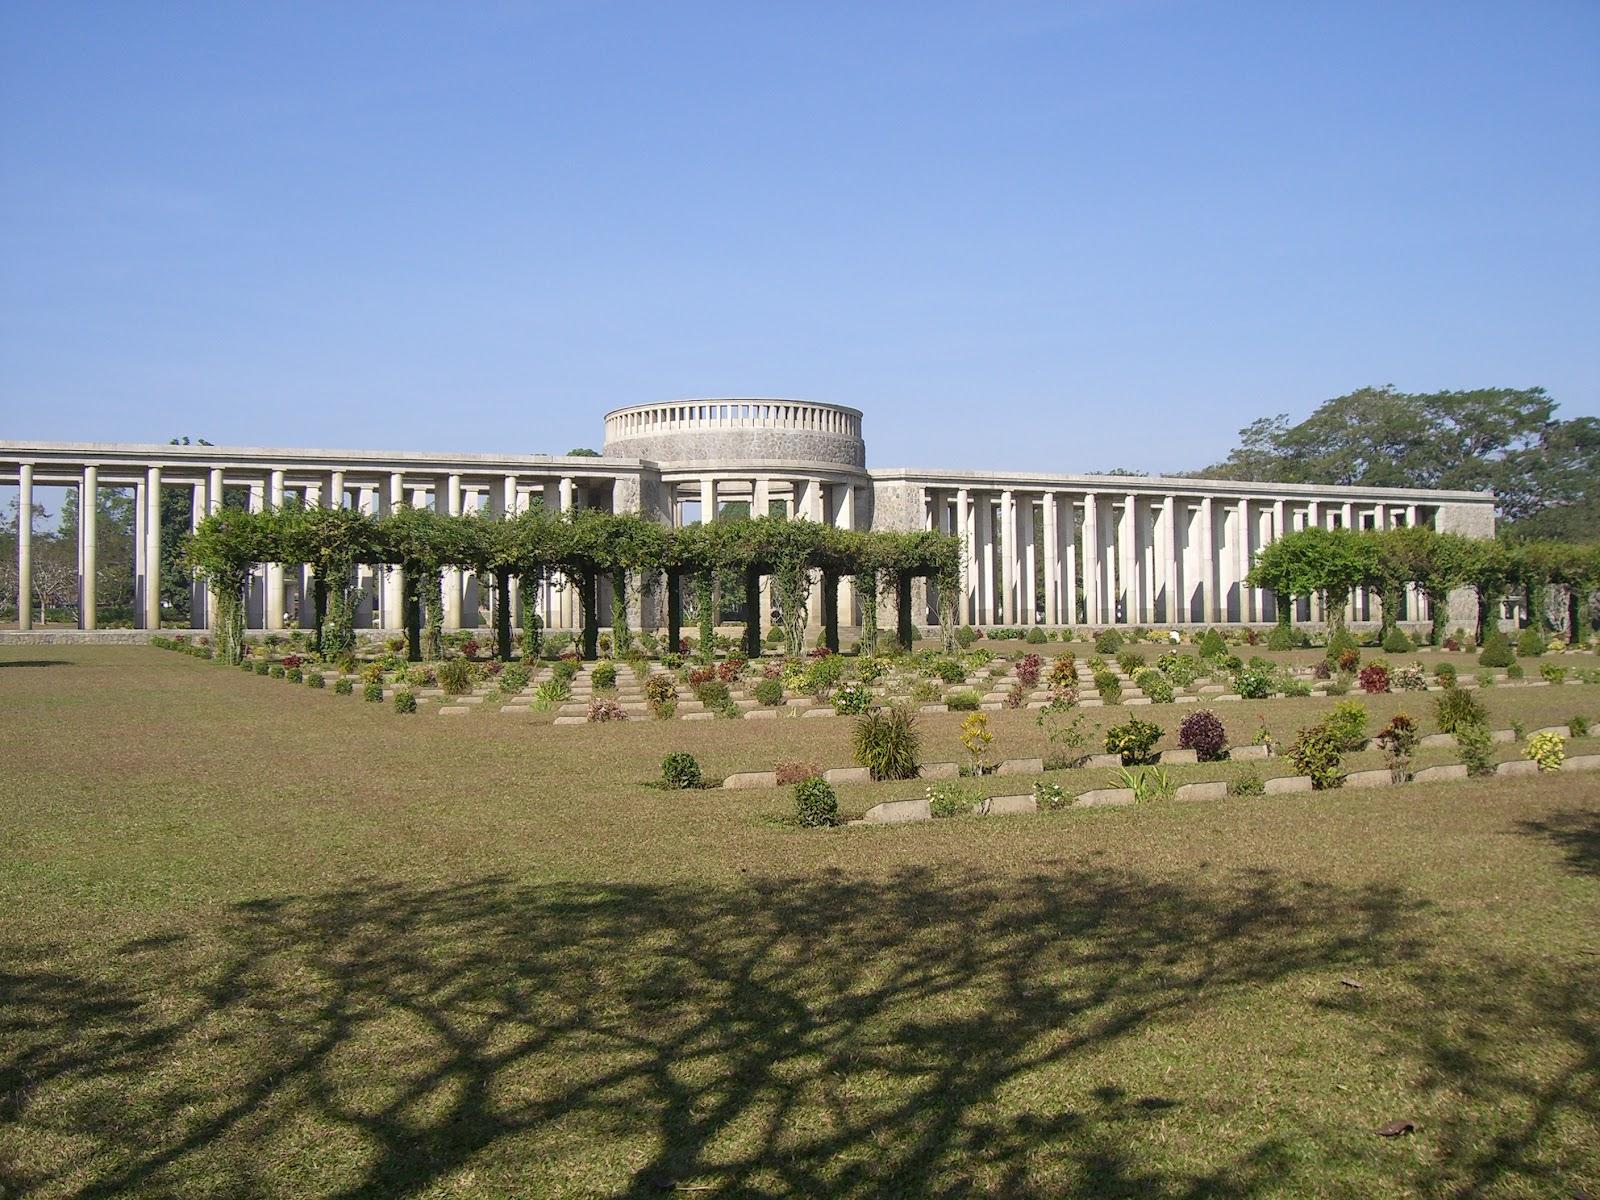 htaukkyant-war-cemetery